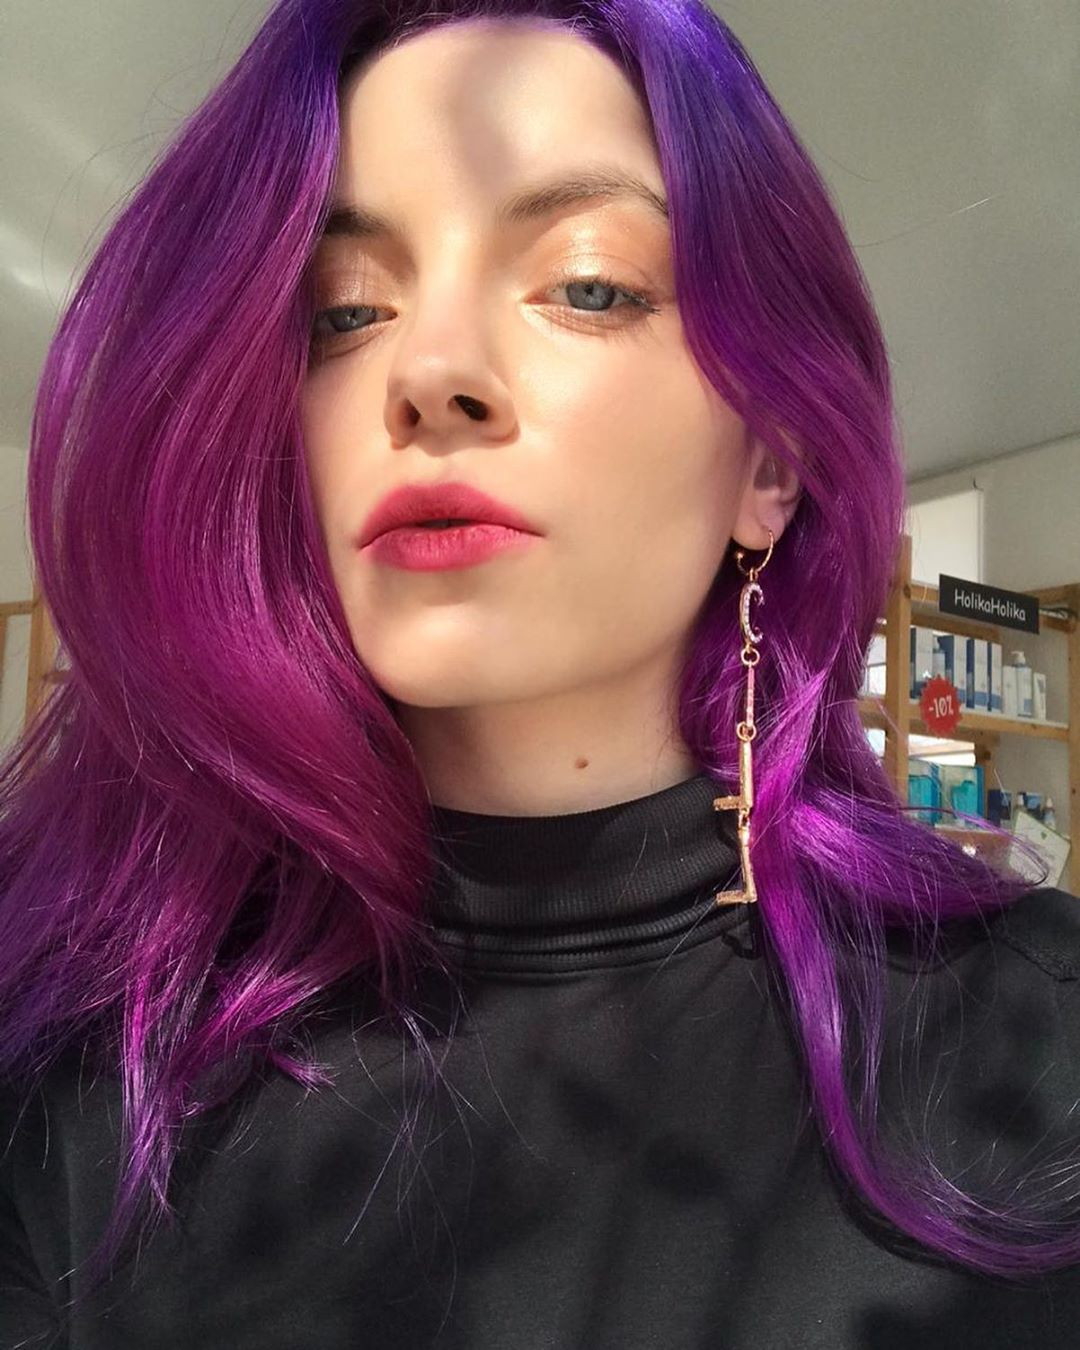 Capelli viola lunghi luminosi con balayage